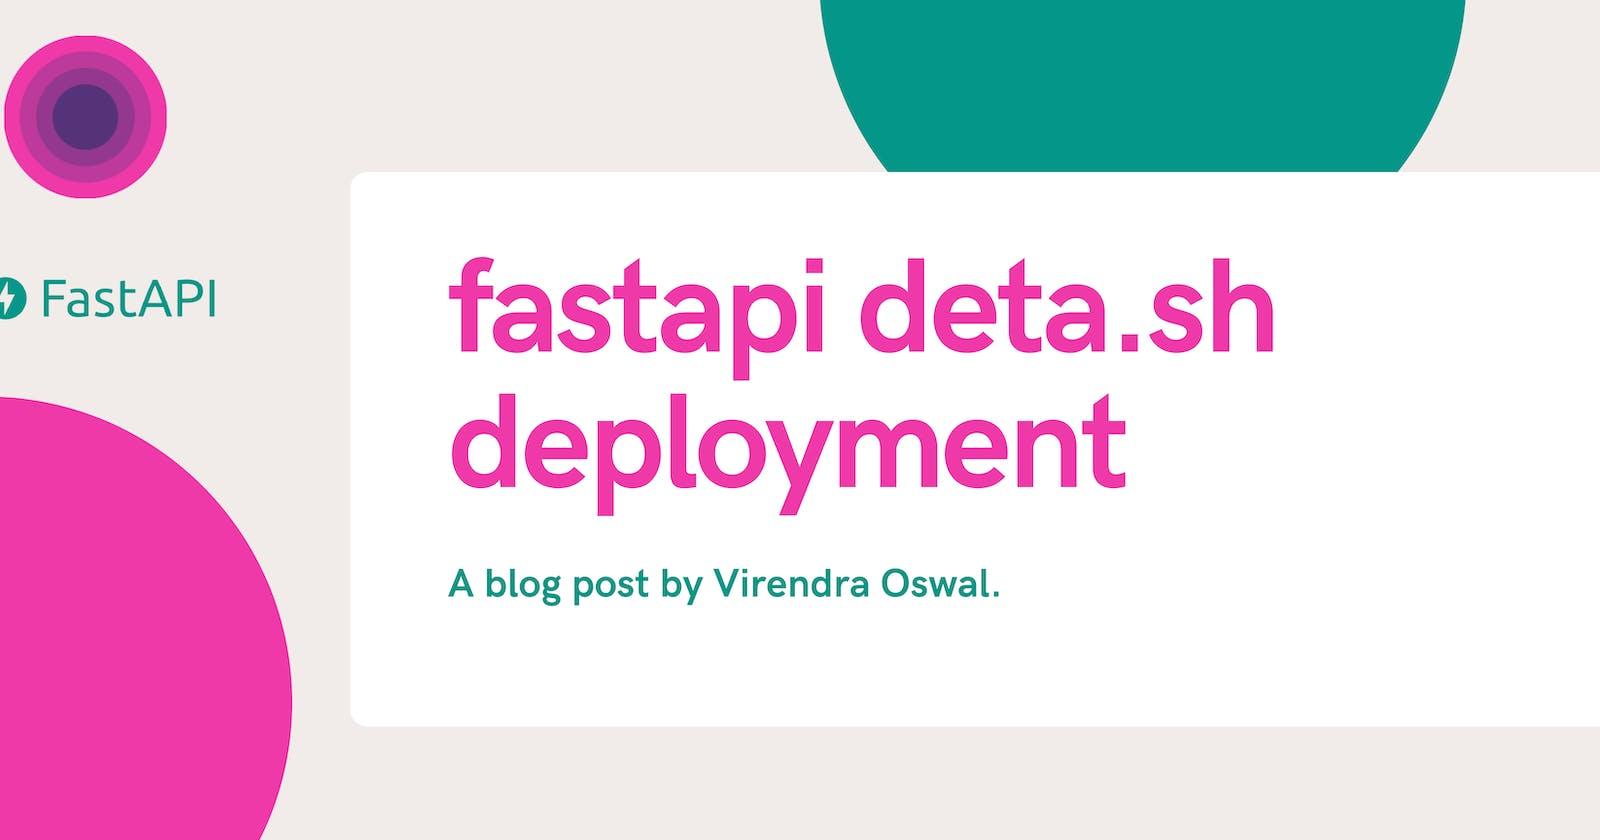 FastAPI Deployment with Deta.sh Cloud